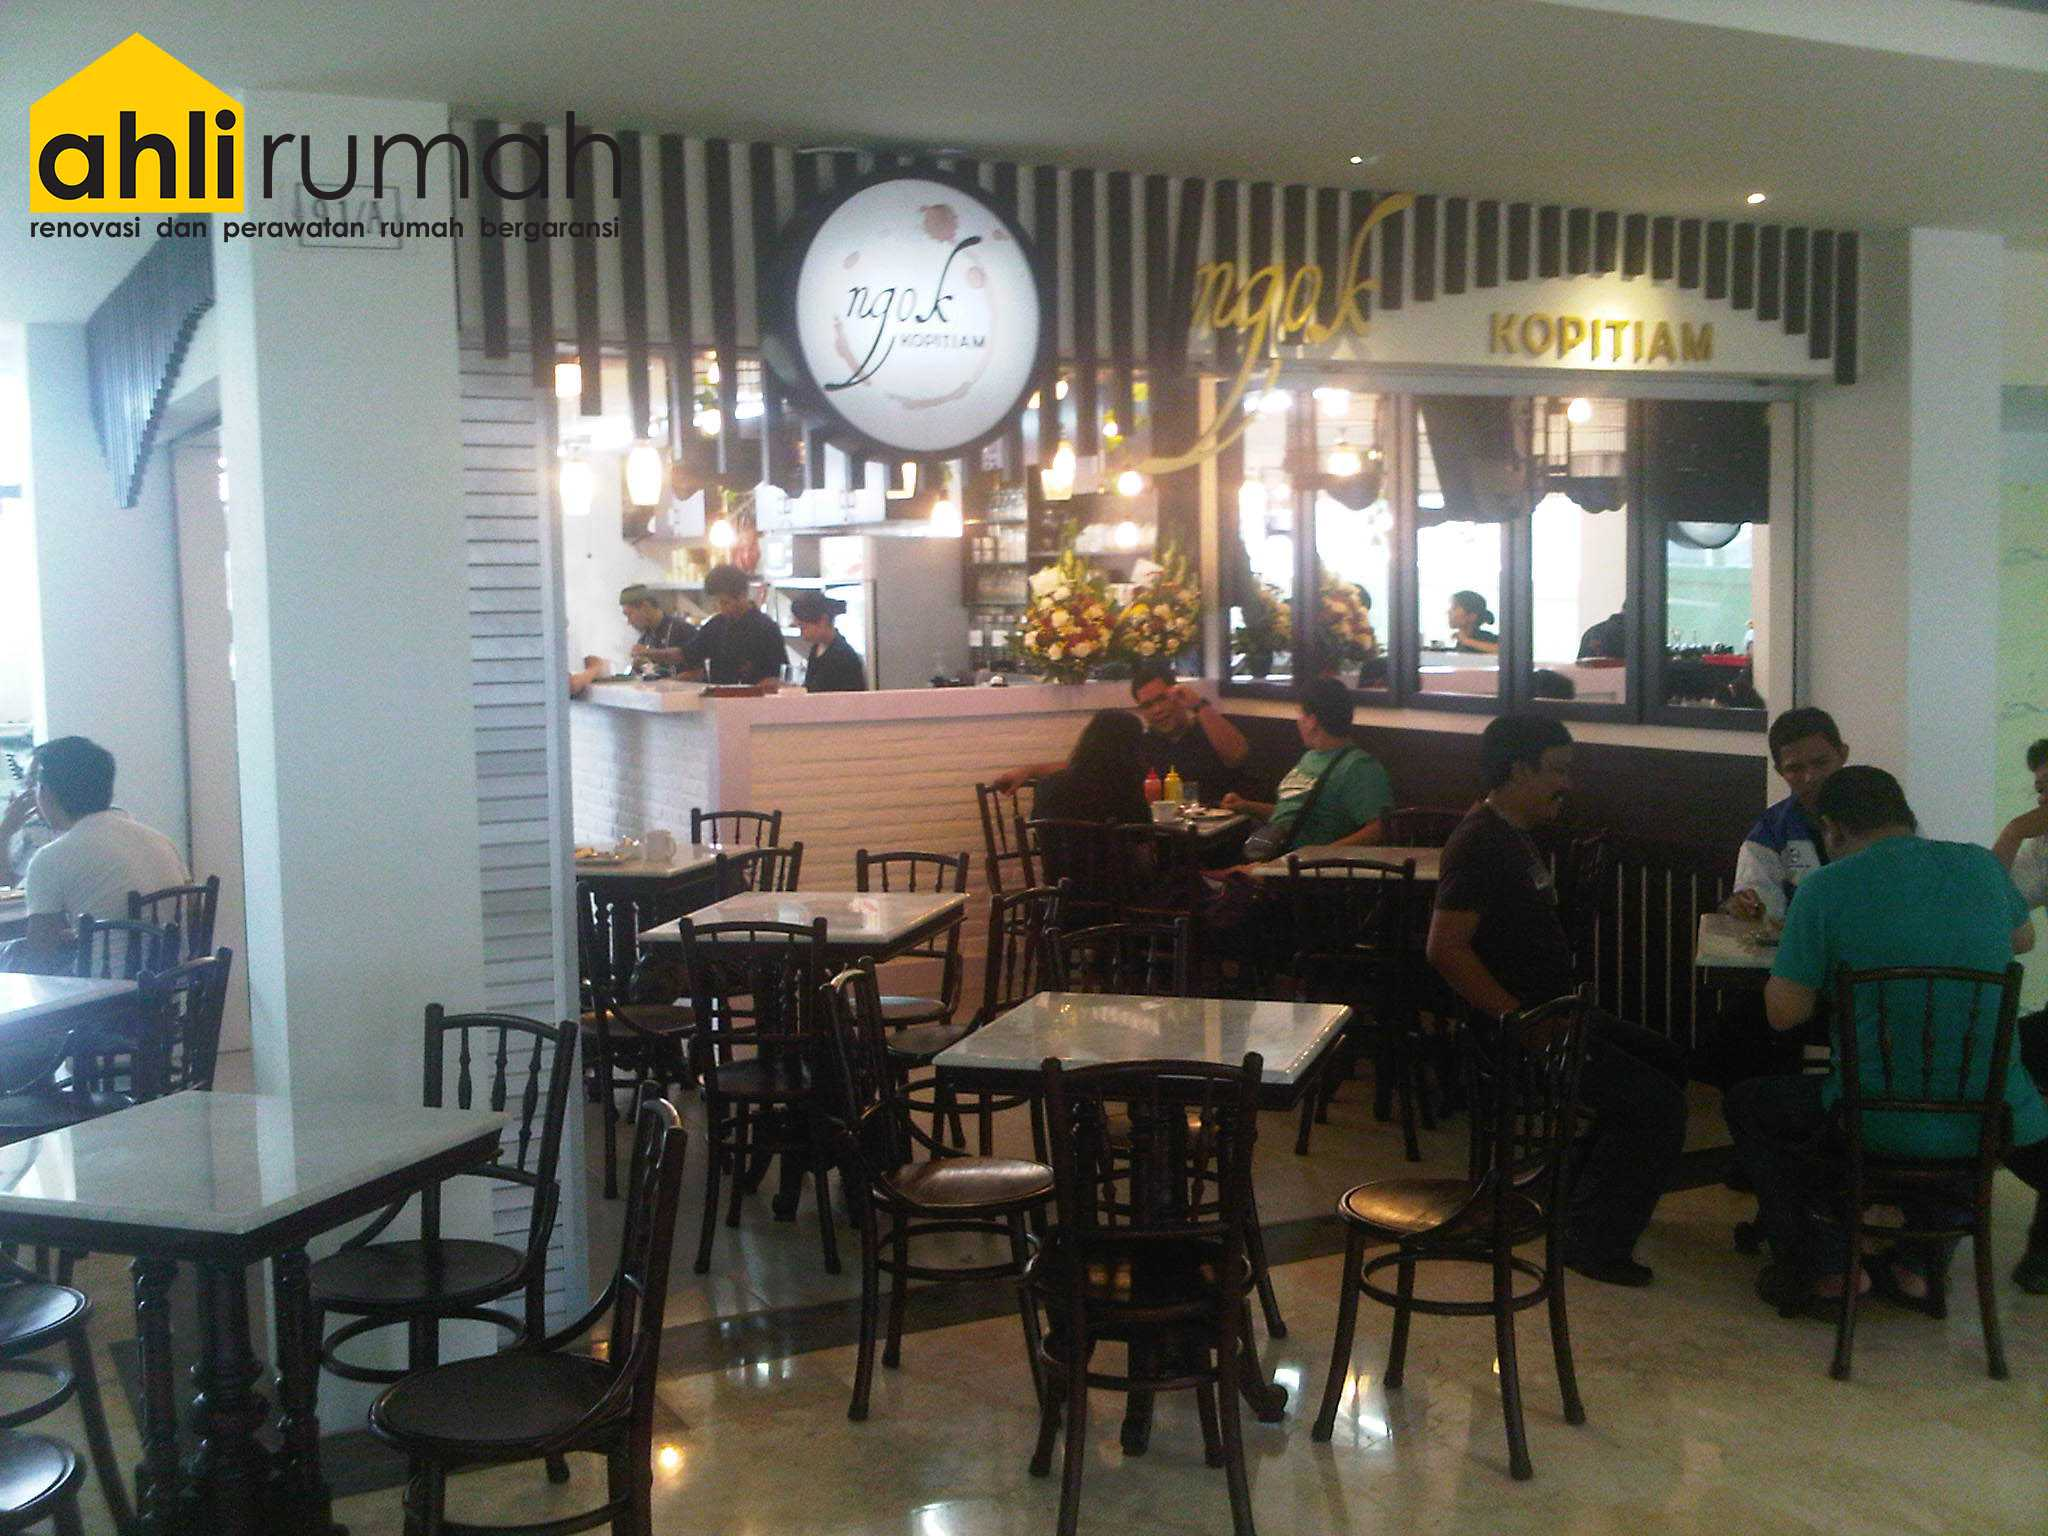 Ahlirumah.id Interior - Cafe Benoa   Ahlirumahid-Interior-Cafe-Benoa   49241